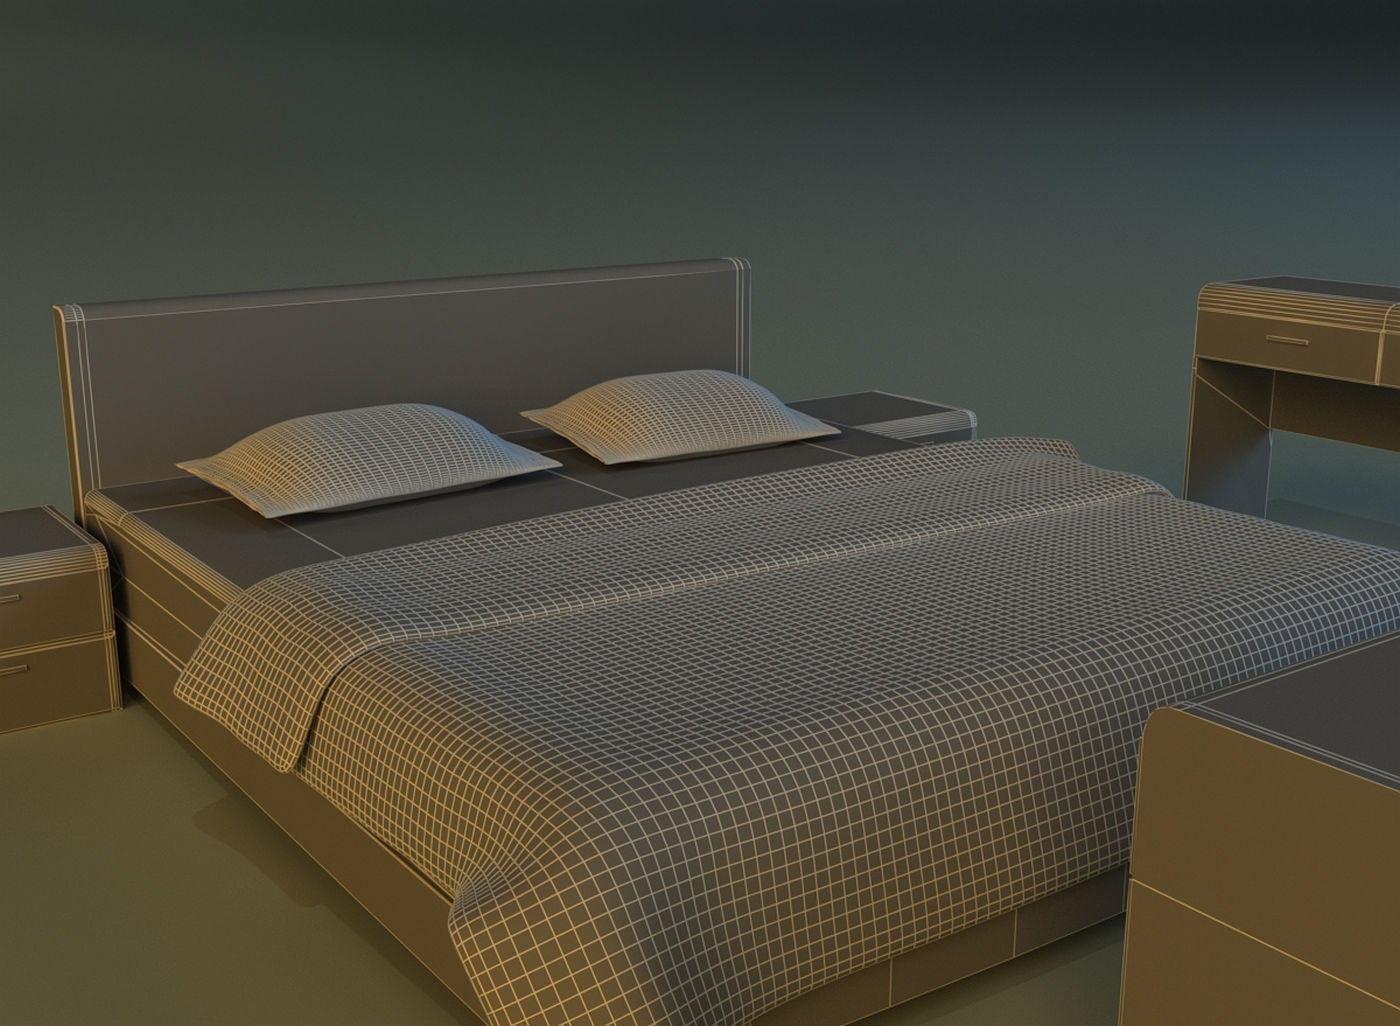 Bed dark wood 3d model max obj 3ds fbx mtl for 3ds max bed model